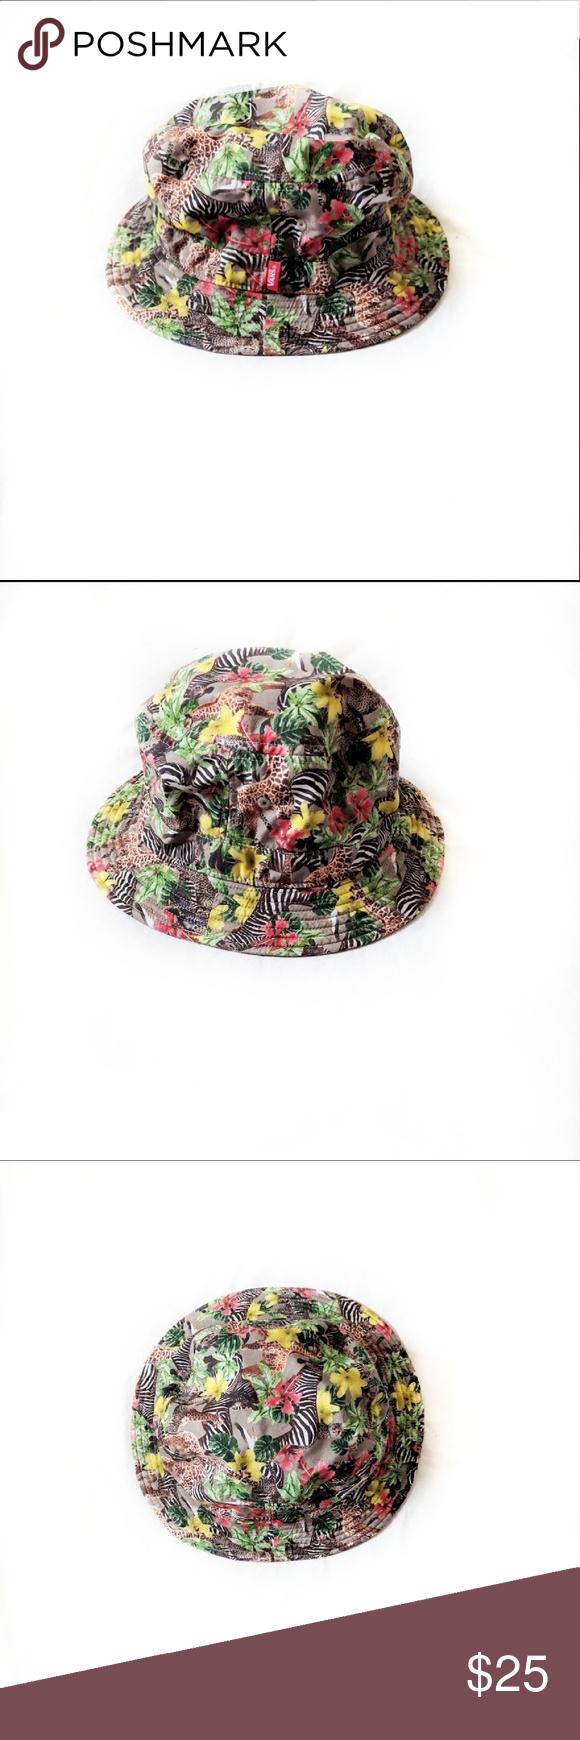 2579fe7436b Vans Safari Jungle Floral Bucket Hat One Size Vans Safari Jungle Floral Bucket  Hat One Size